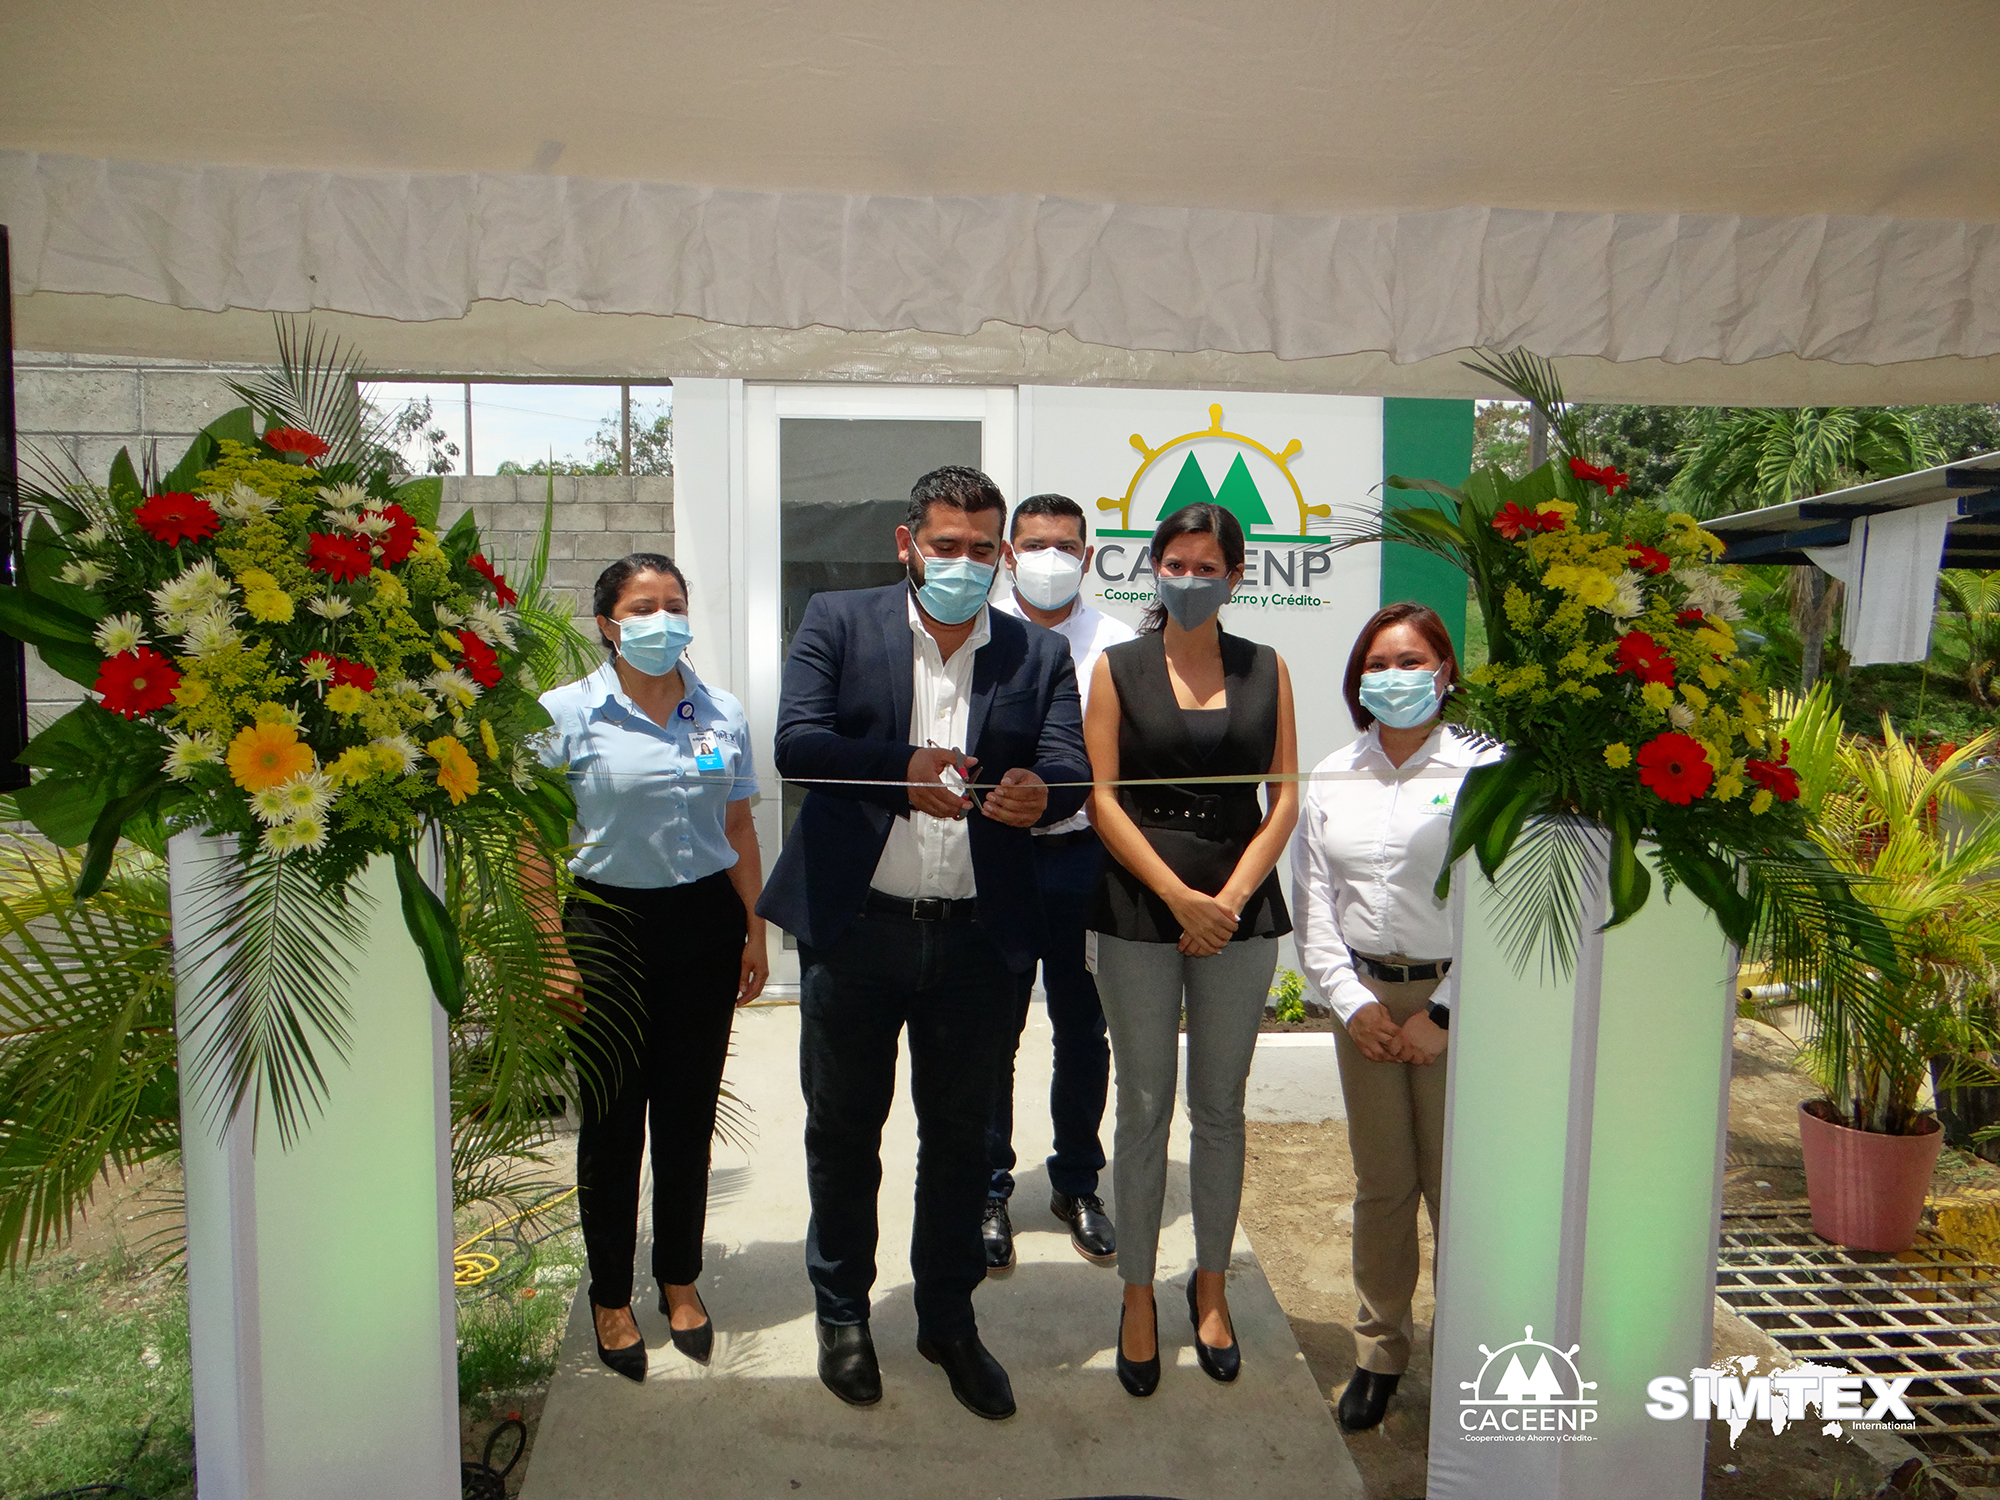 SIMTEX INAUGURA FILIAL DE COOPERATIVA CACEENP